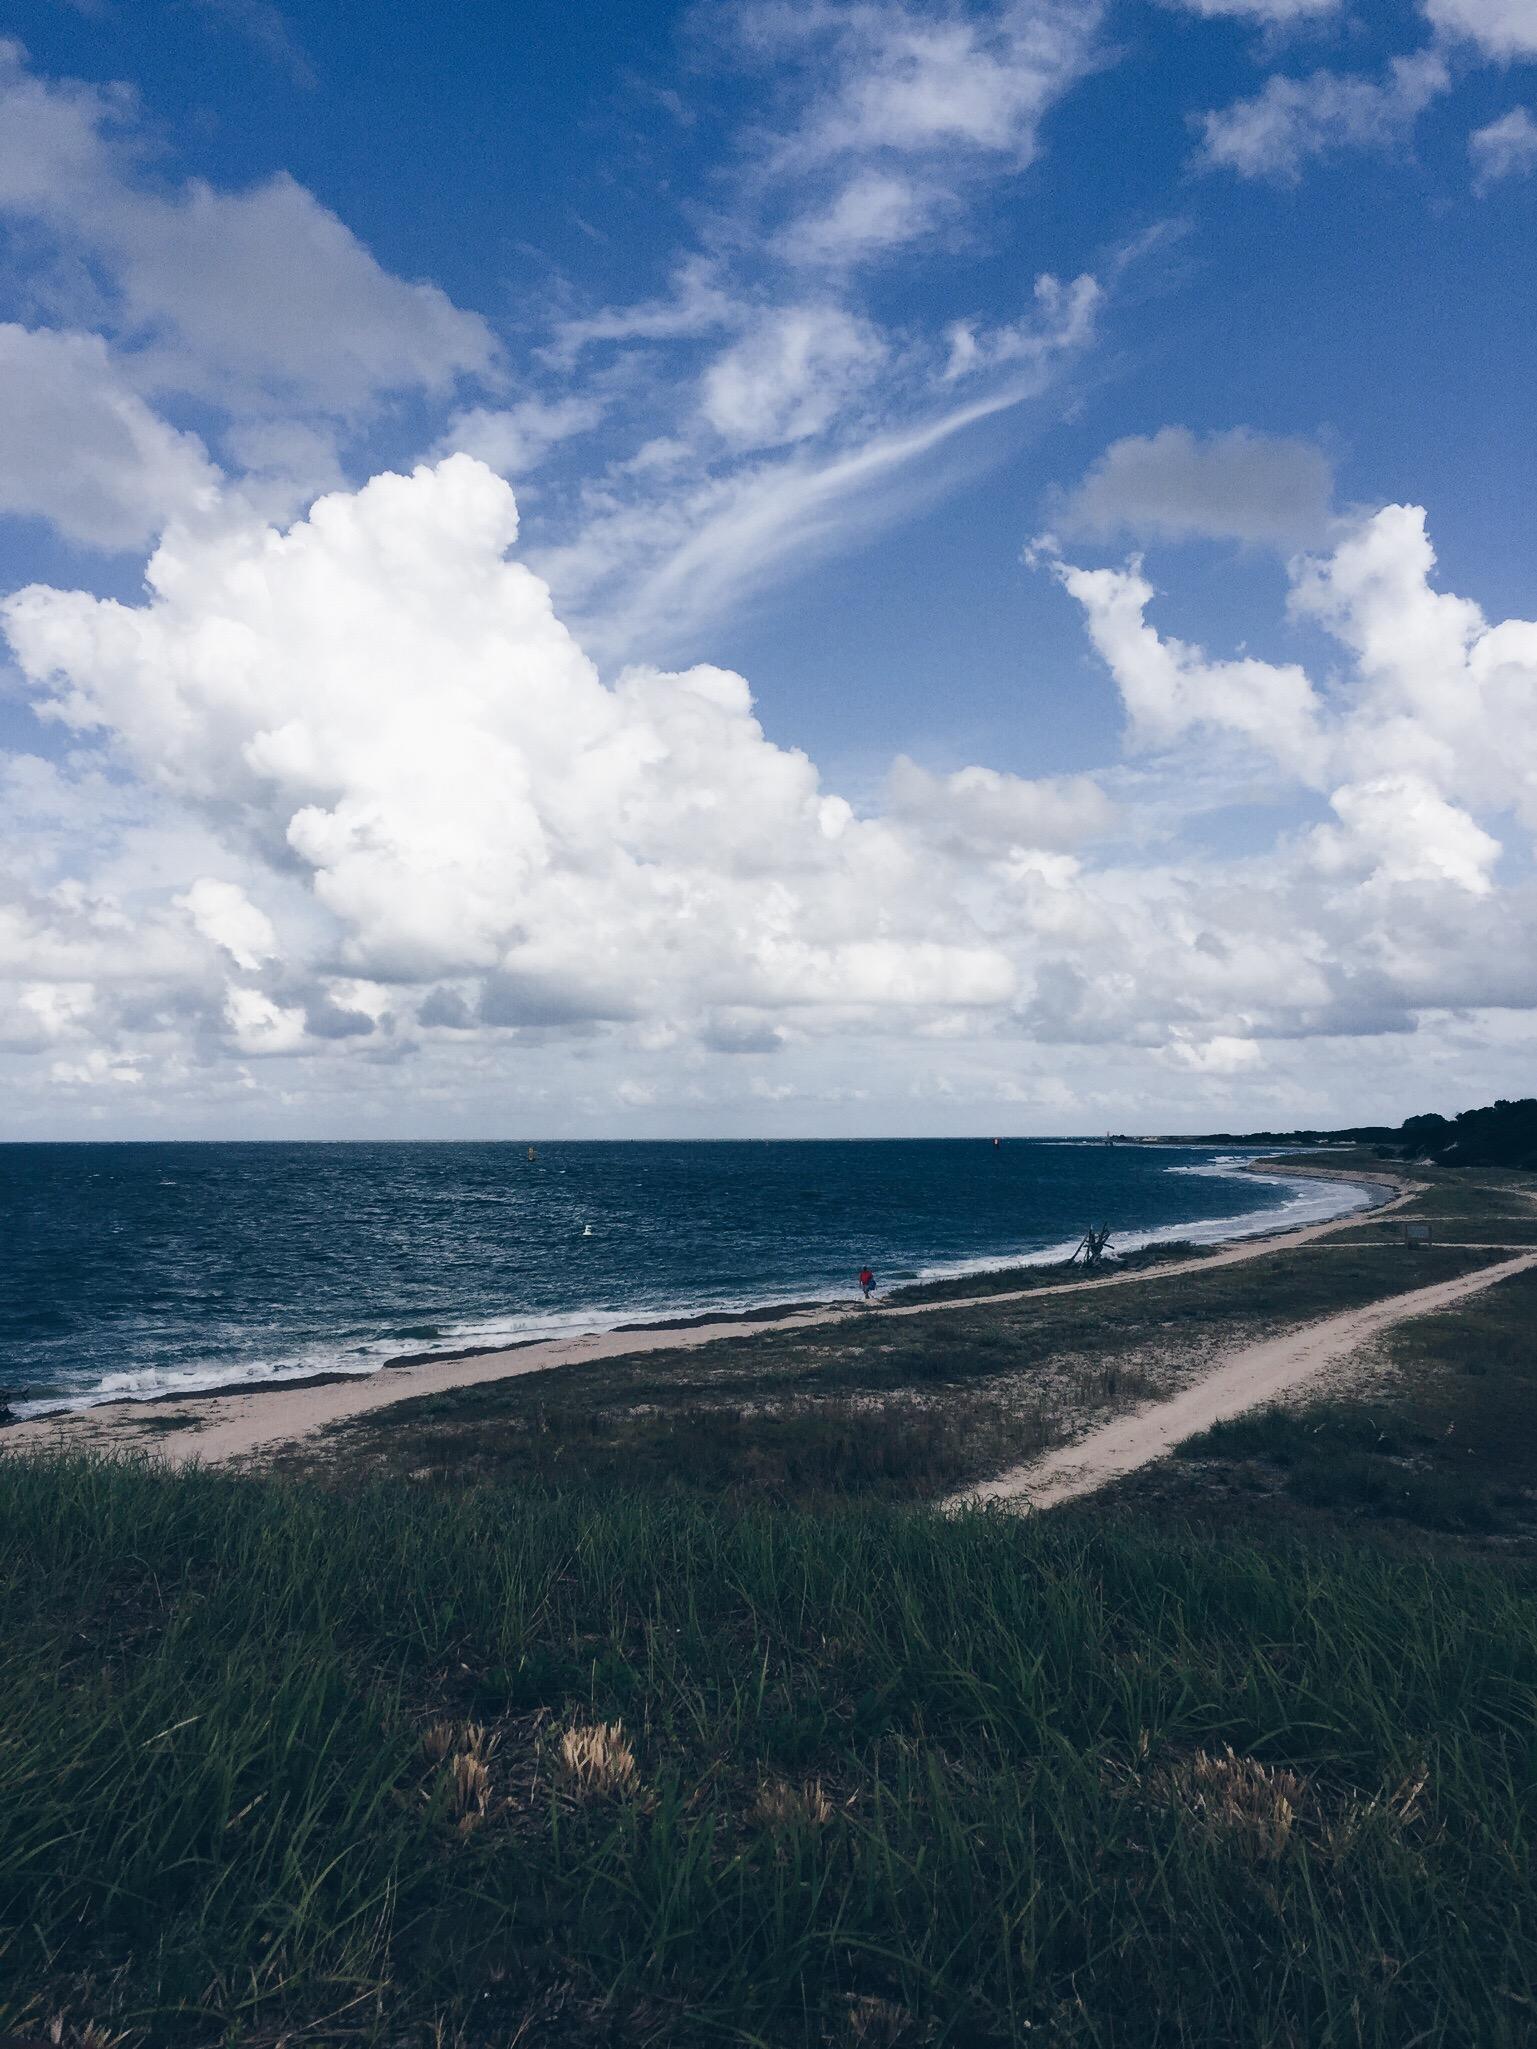 FORT CLINCH - FL (via JacinthaPayne.com)